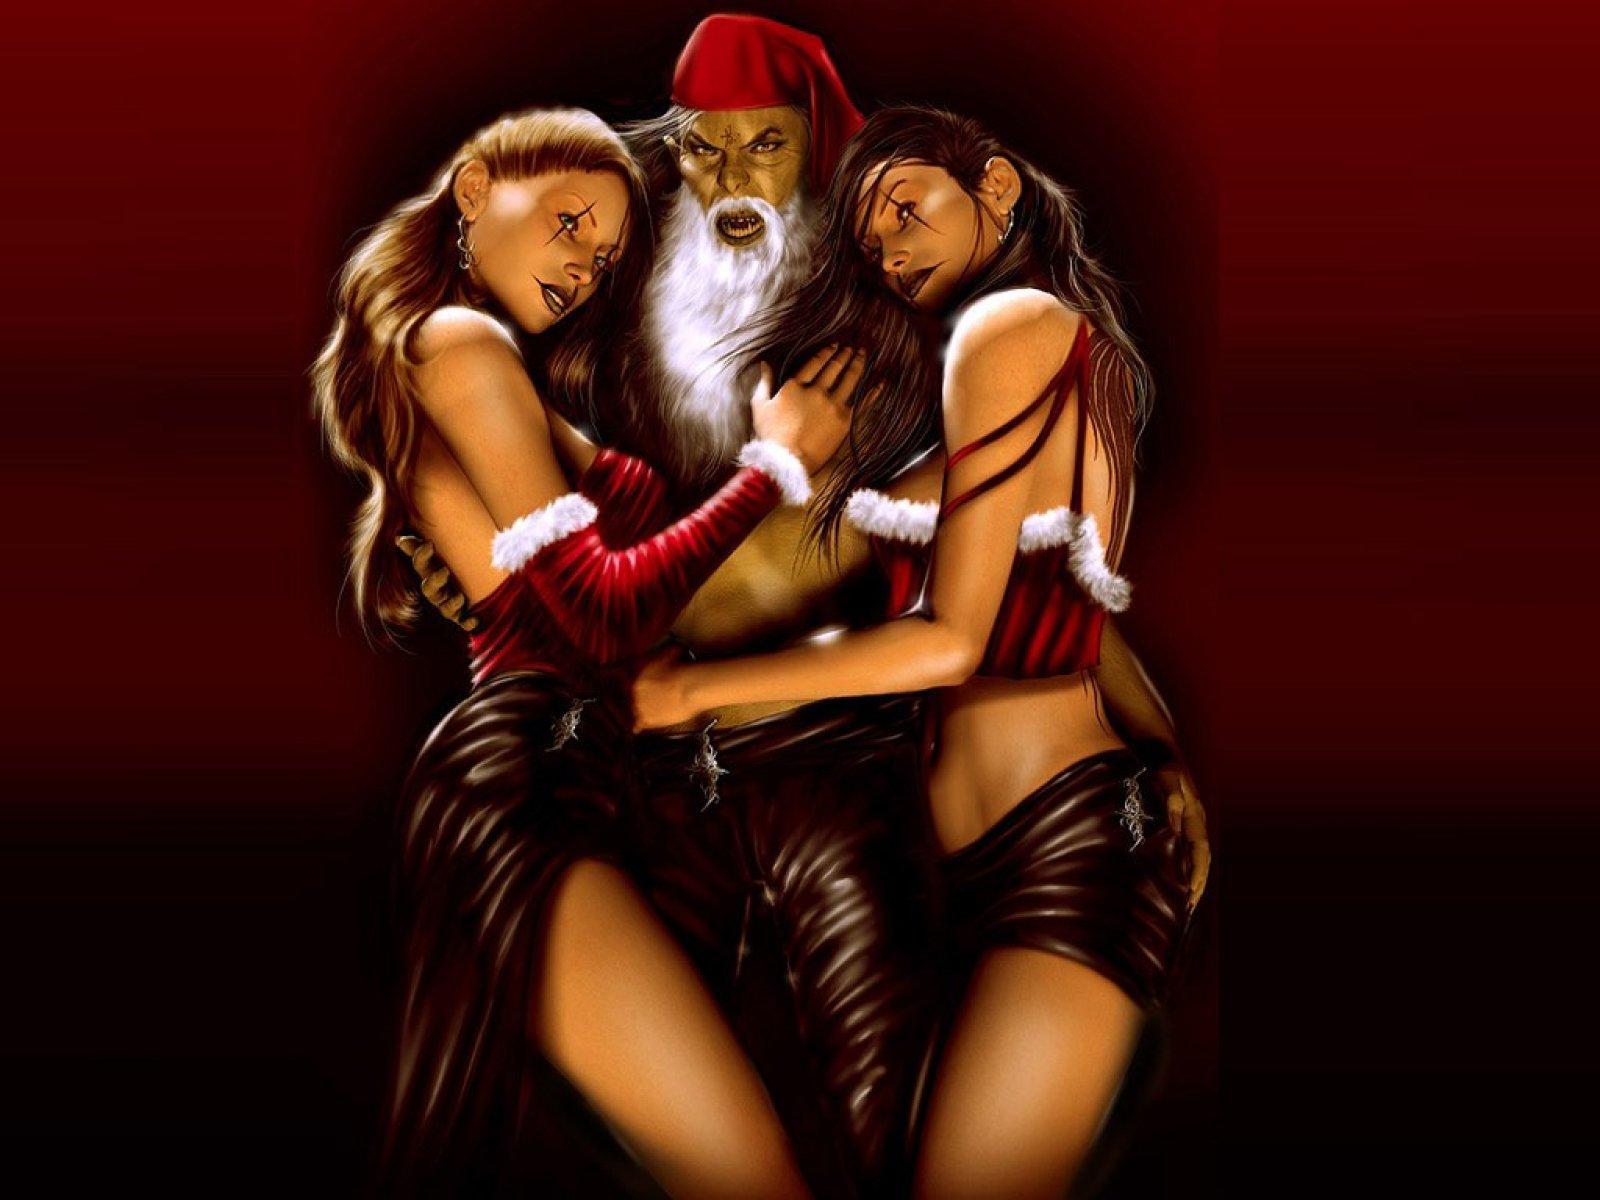 Santa evil sexy sexy video